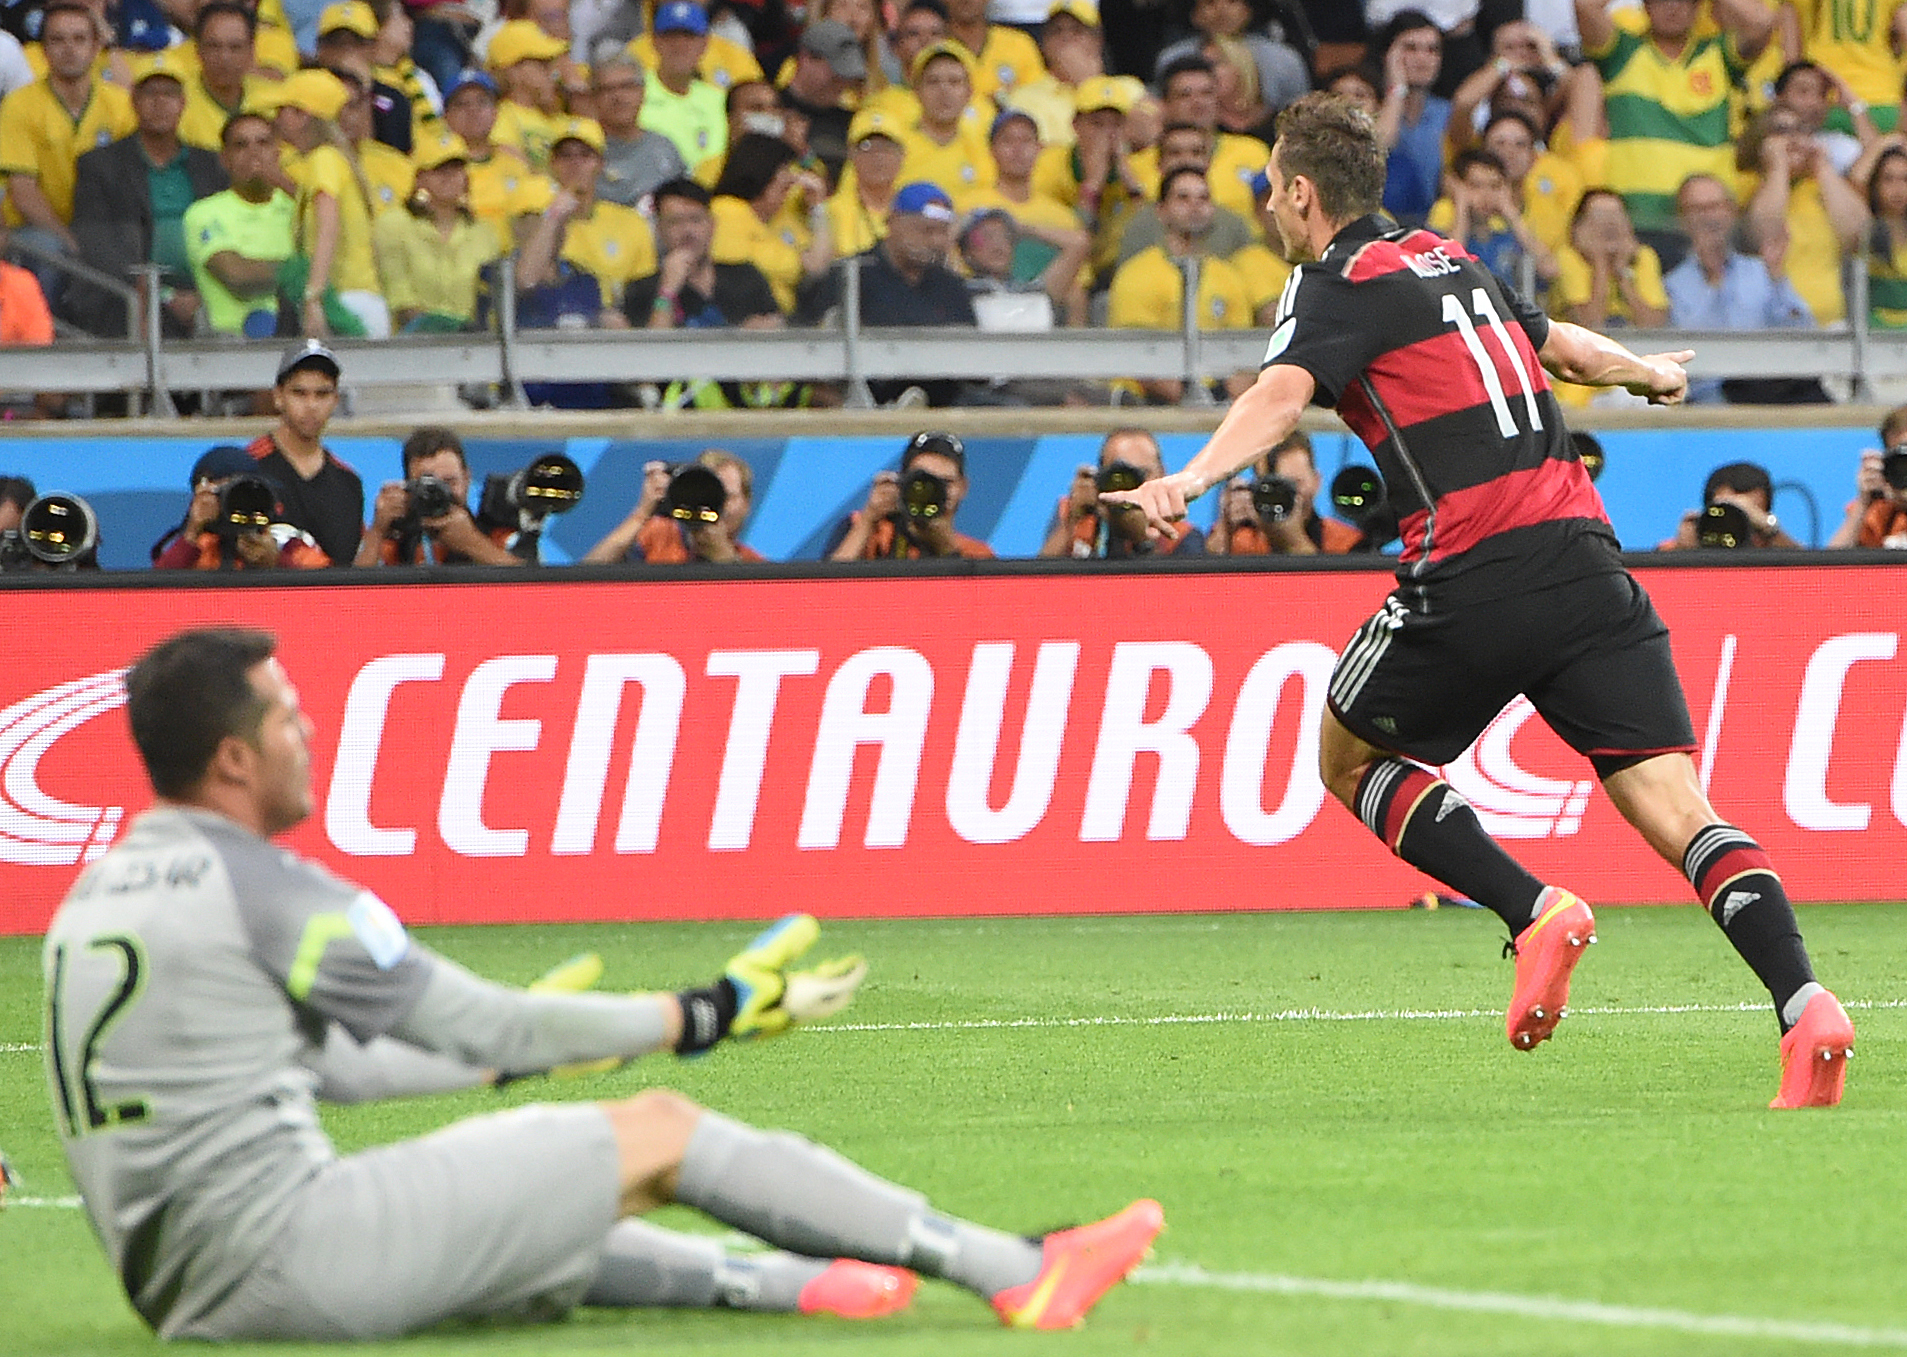 World Cup 2014 - Brazil - Germany